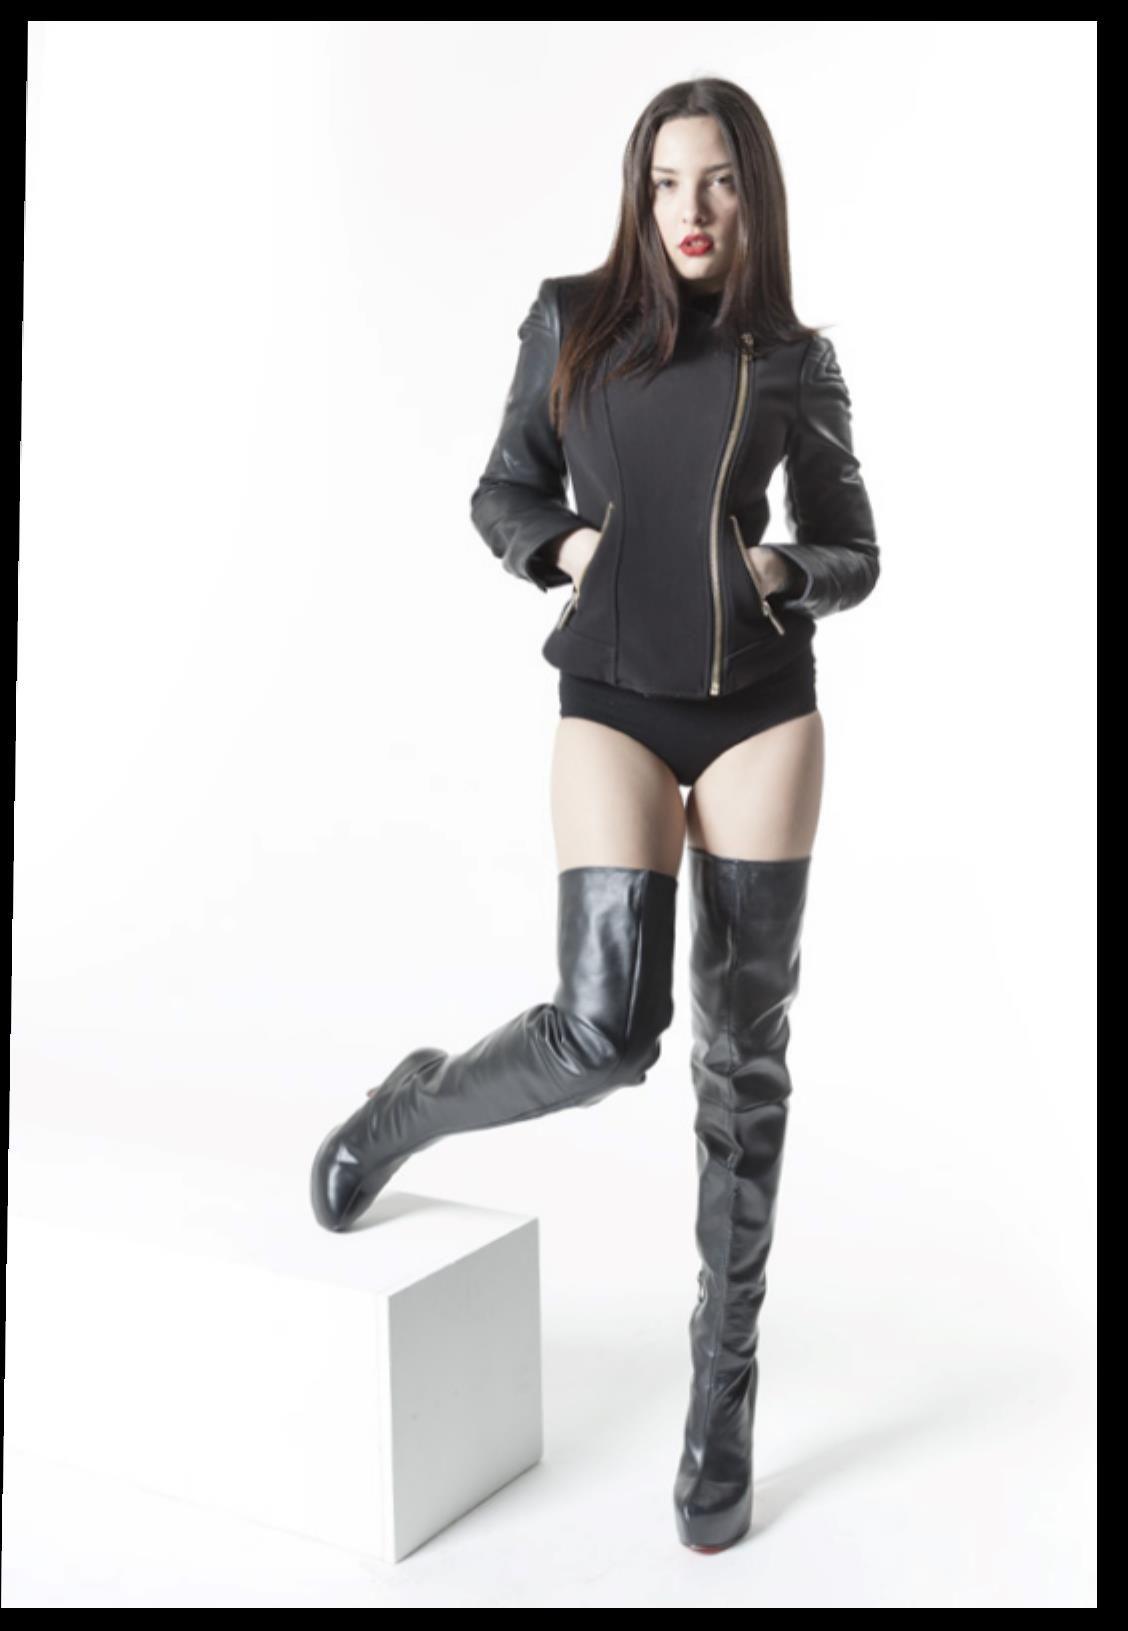 Arollo Leather Heeled Boots Be99cdc18c33e315189763f7b8ef1f1f